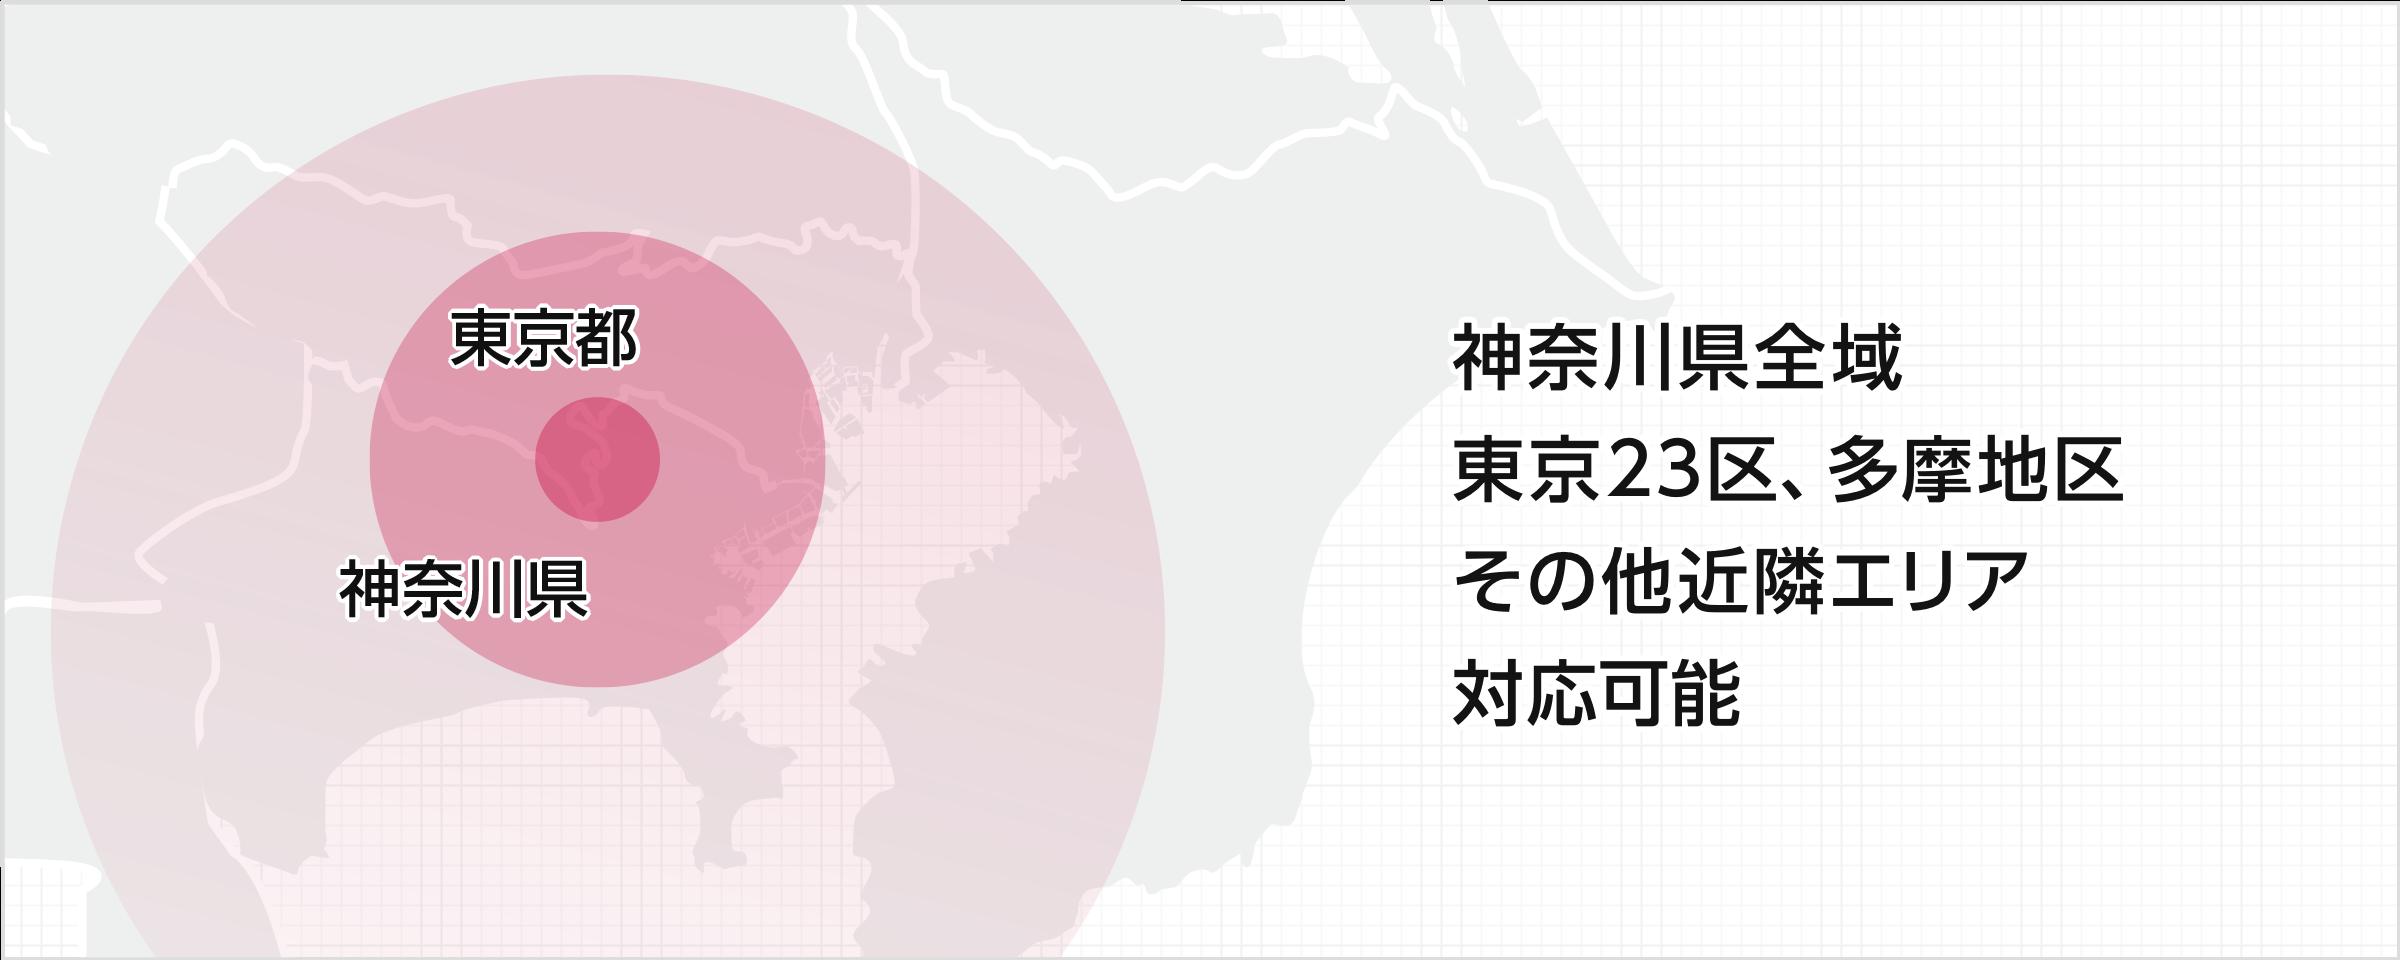 神奈川県全域 東京23区、多摩地区 その他近隣エリア 対応可能